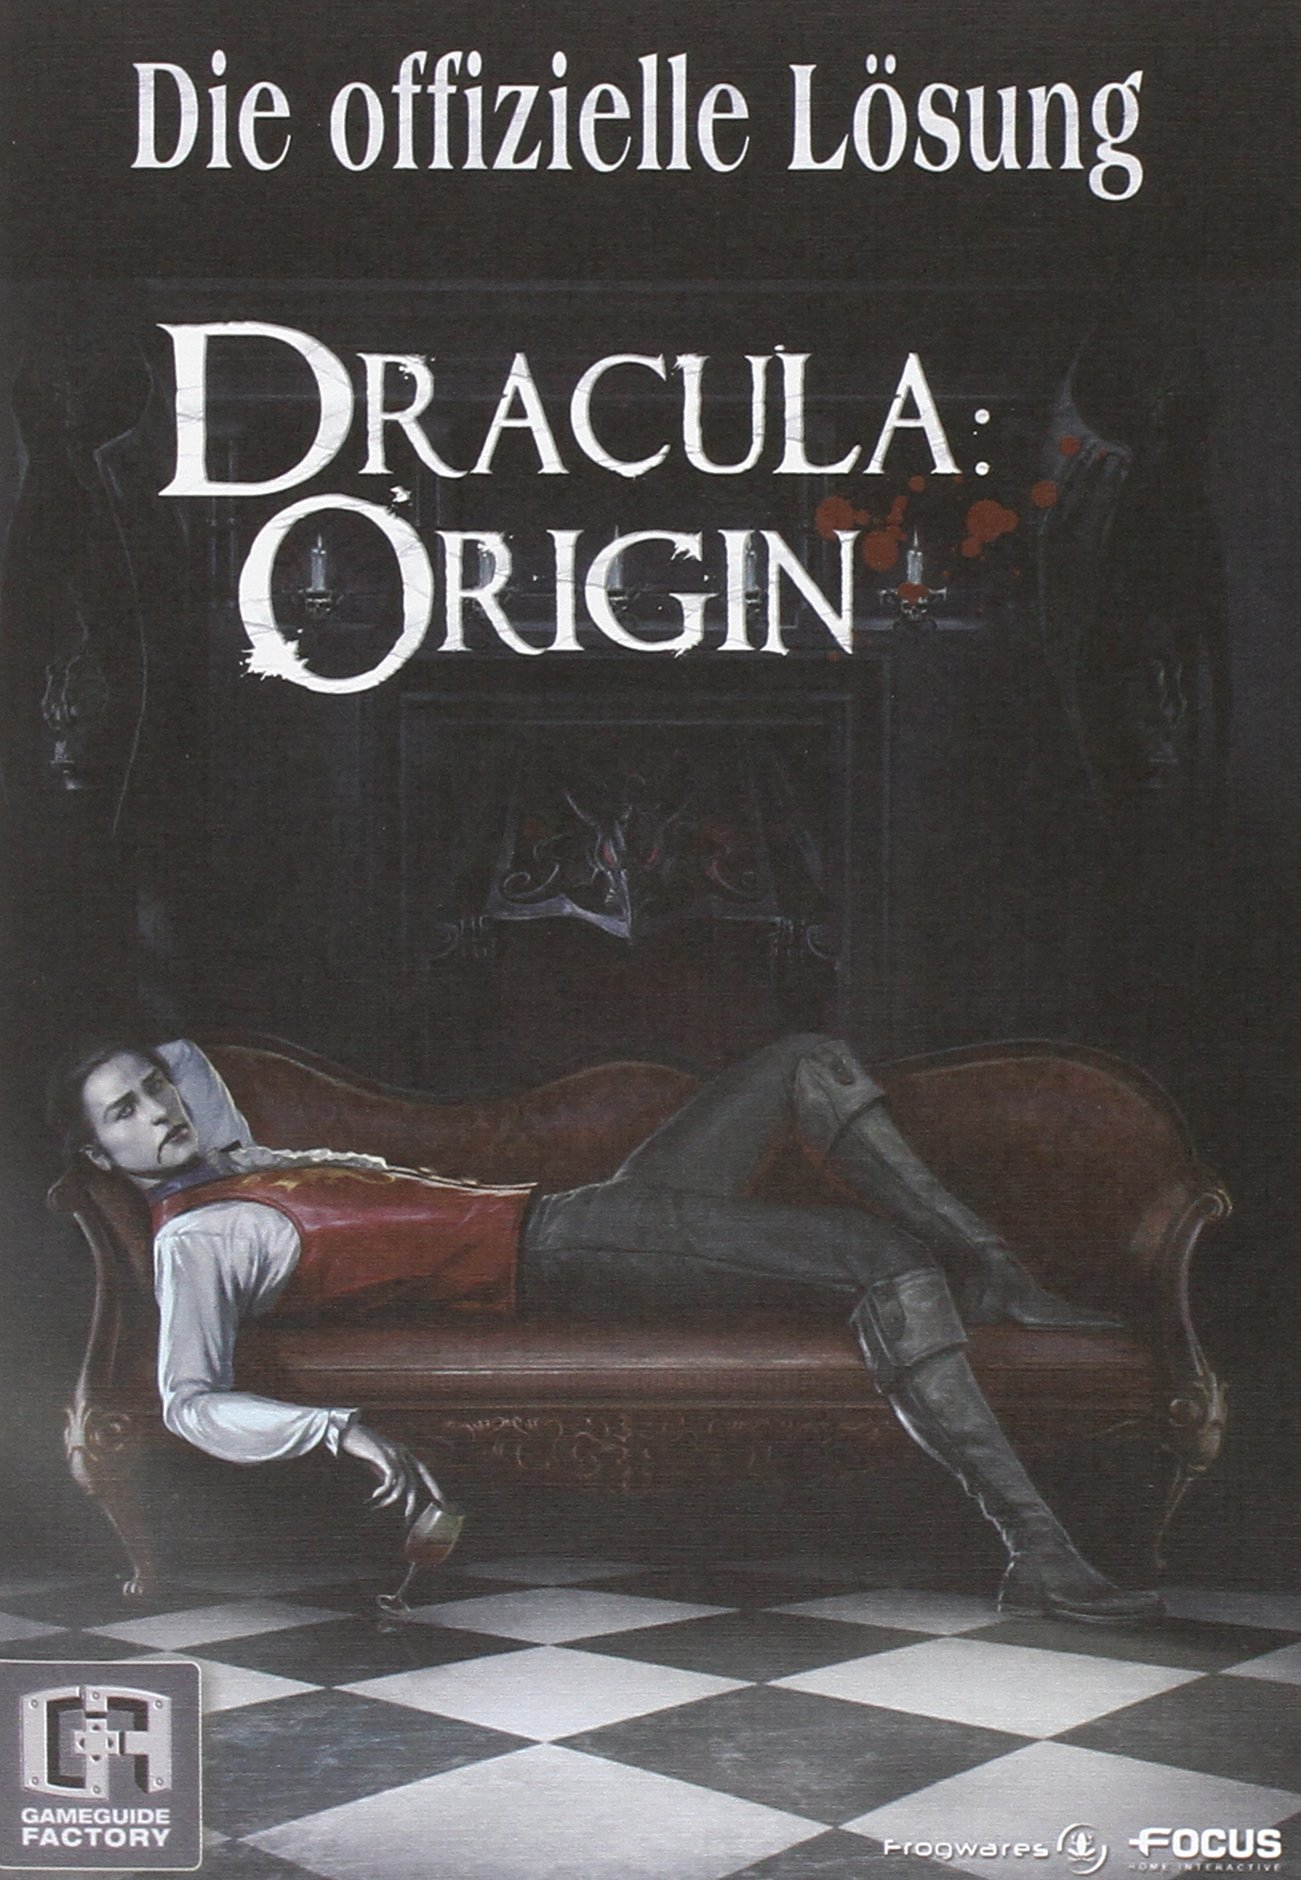 Dracula: Origin - Die offizielle Lösung (Lösungsbuch)